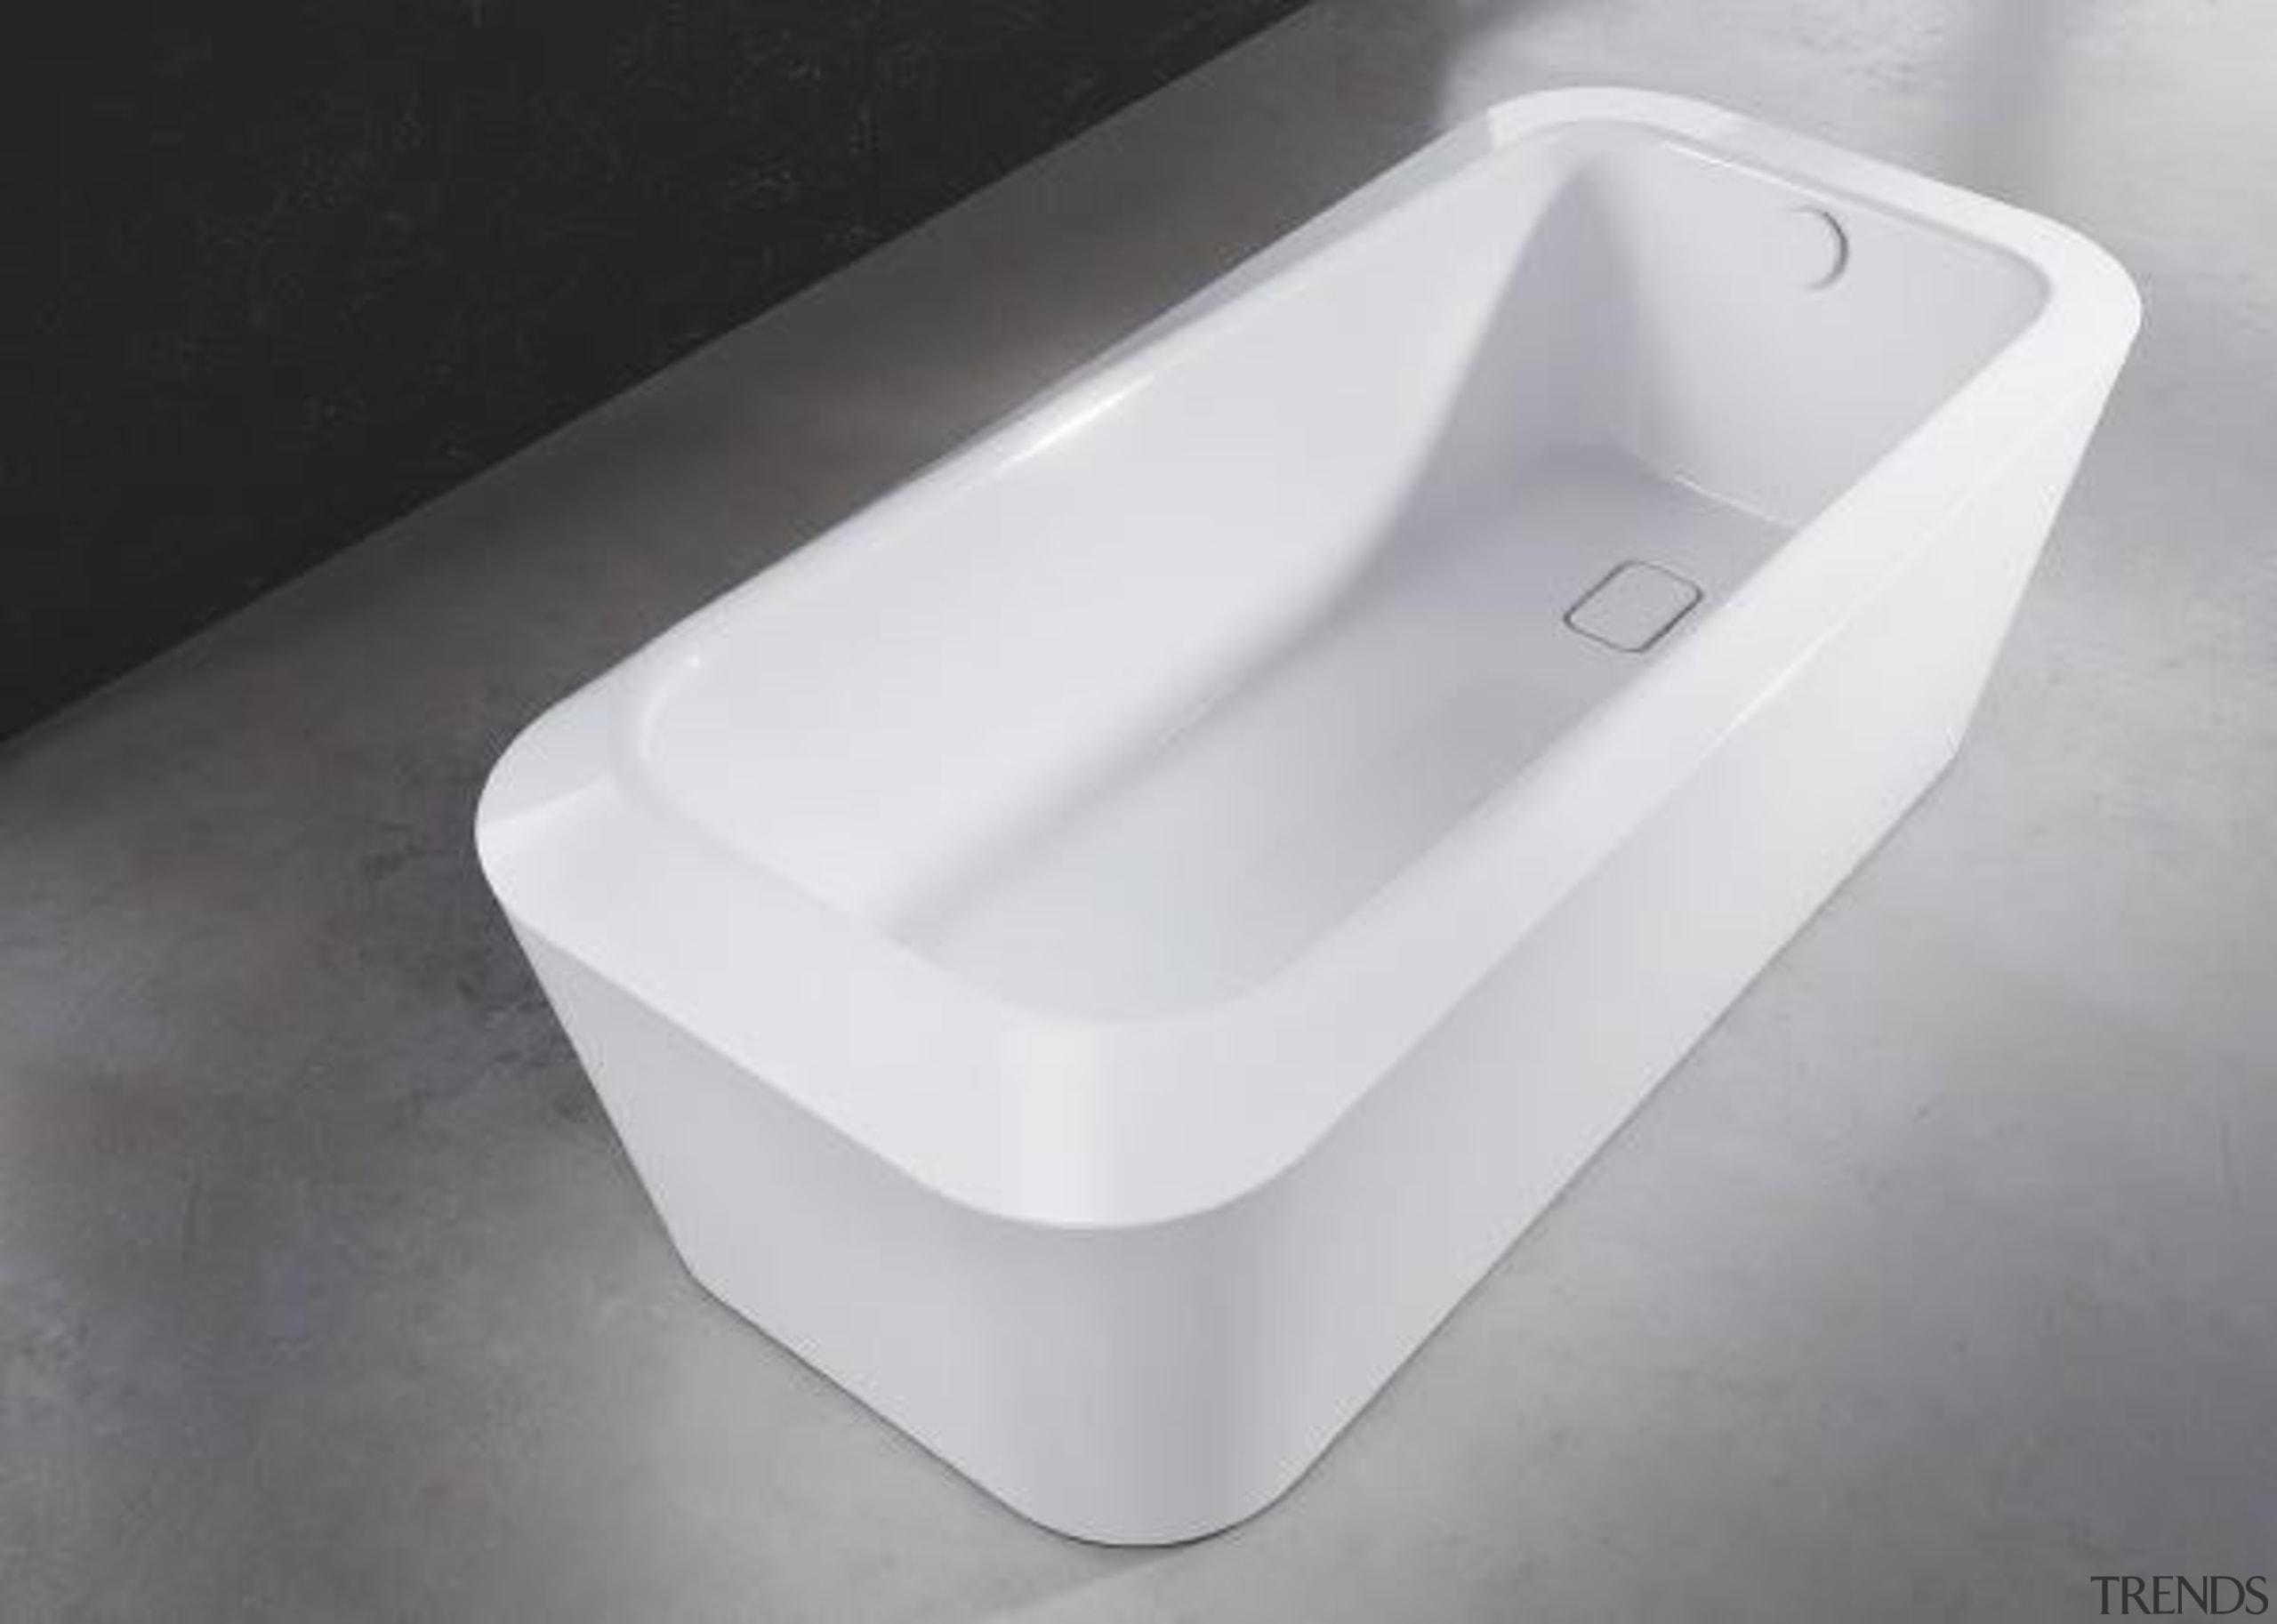 Working with star designer Arik Levy, Kaldewei has bathroom sink, bathtub, hardware, plumbing fixture, product, product design, tap, toilet seat, white, gray